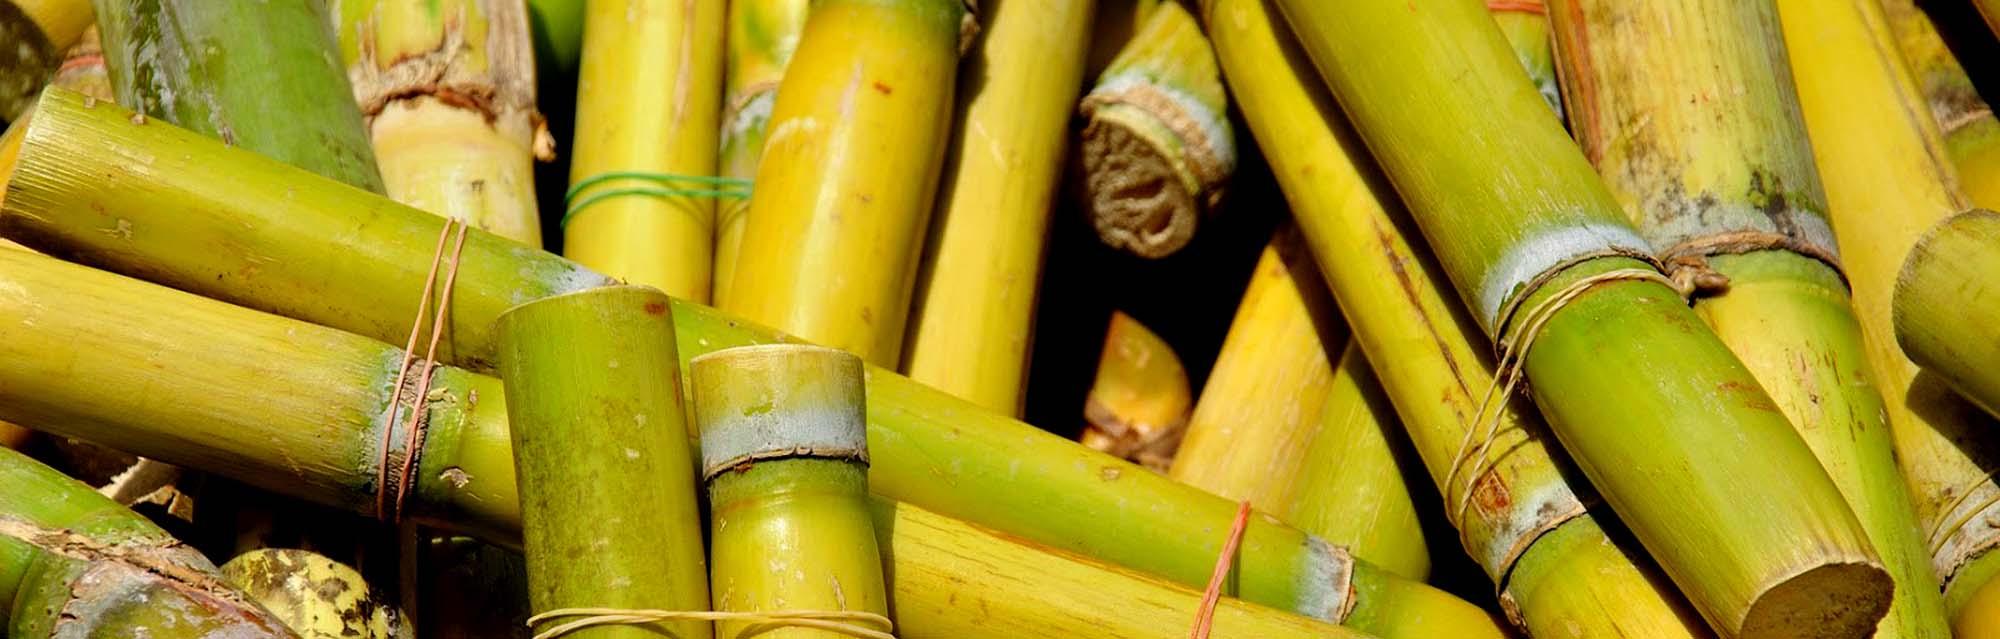 05_PinkPig_sugarcane_HR